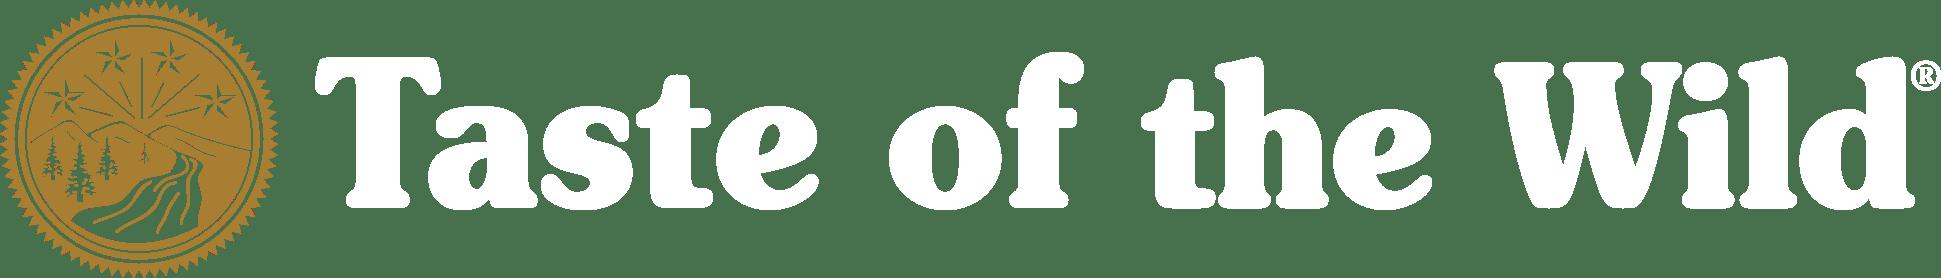 totw-logo_home-banner